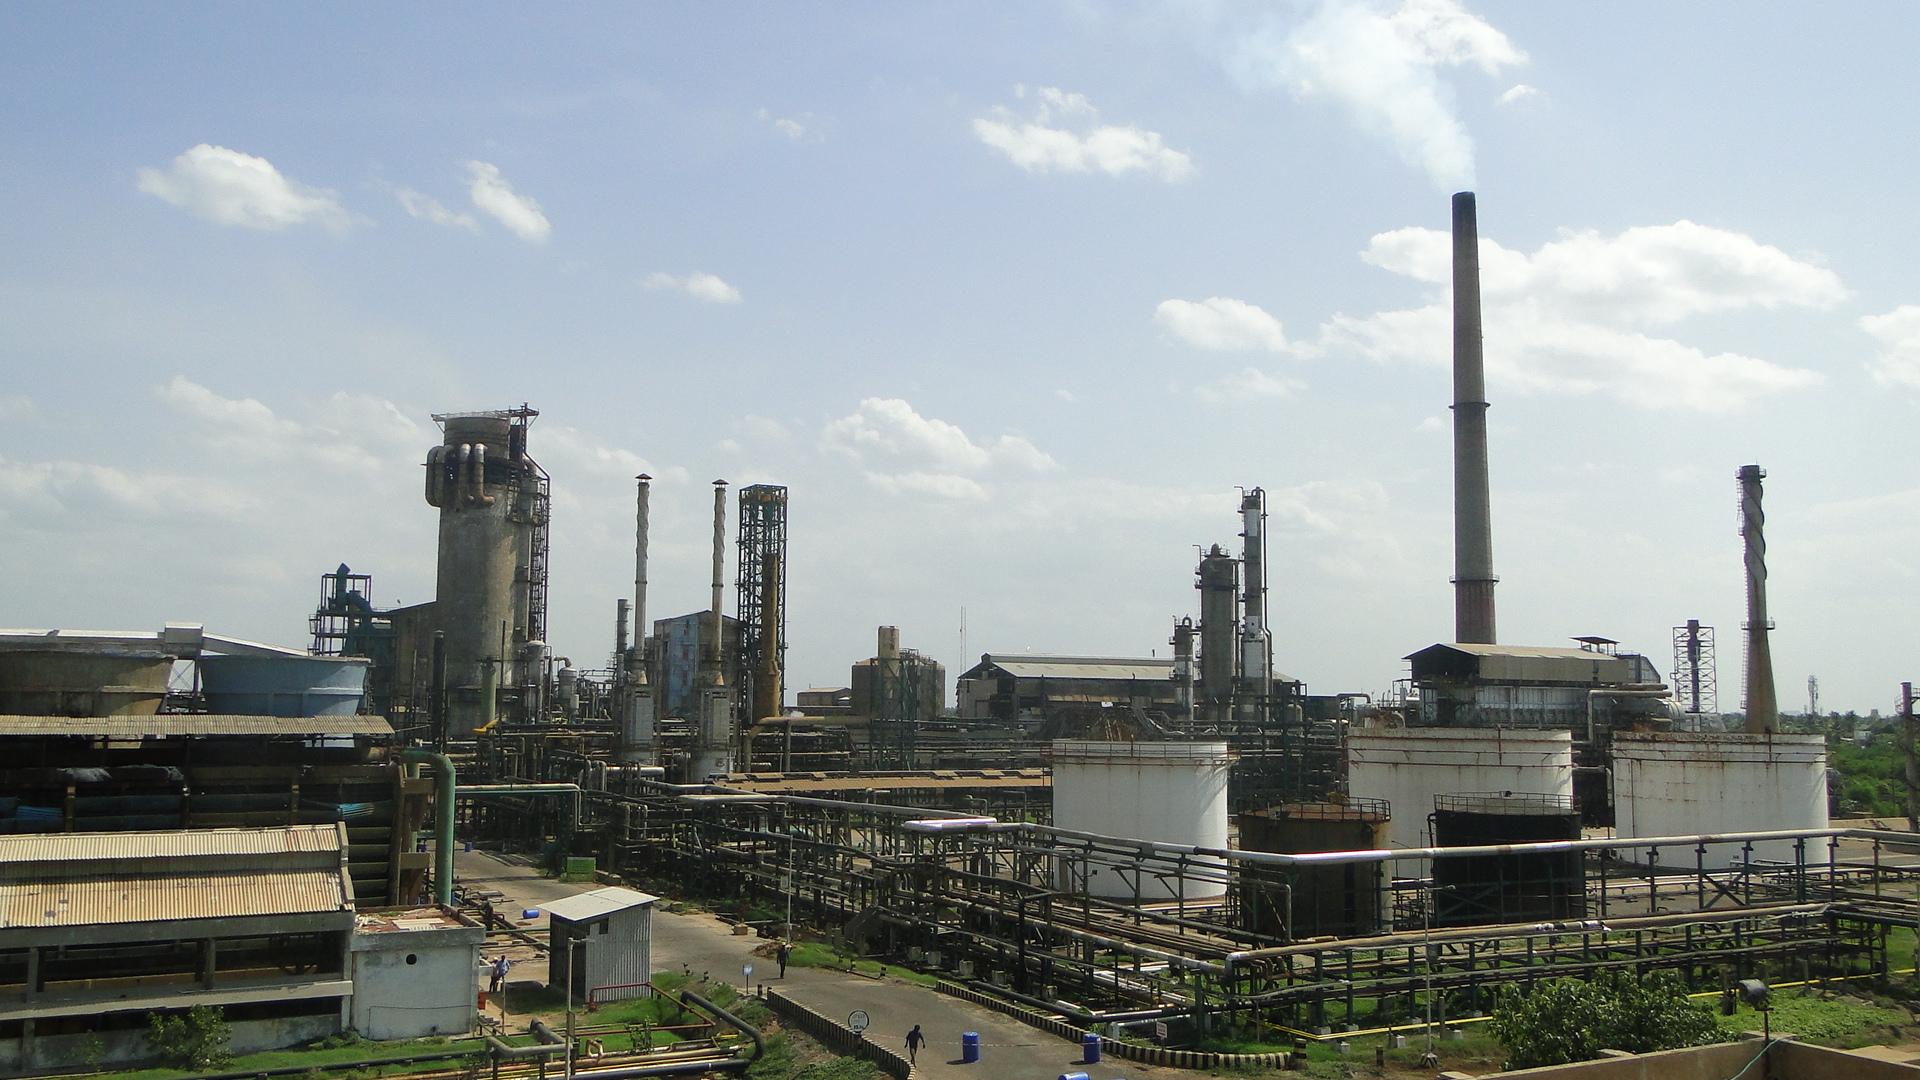 Madras Fertilizers Limited – Manufacturers of Fertilizers